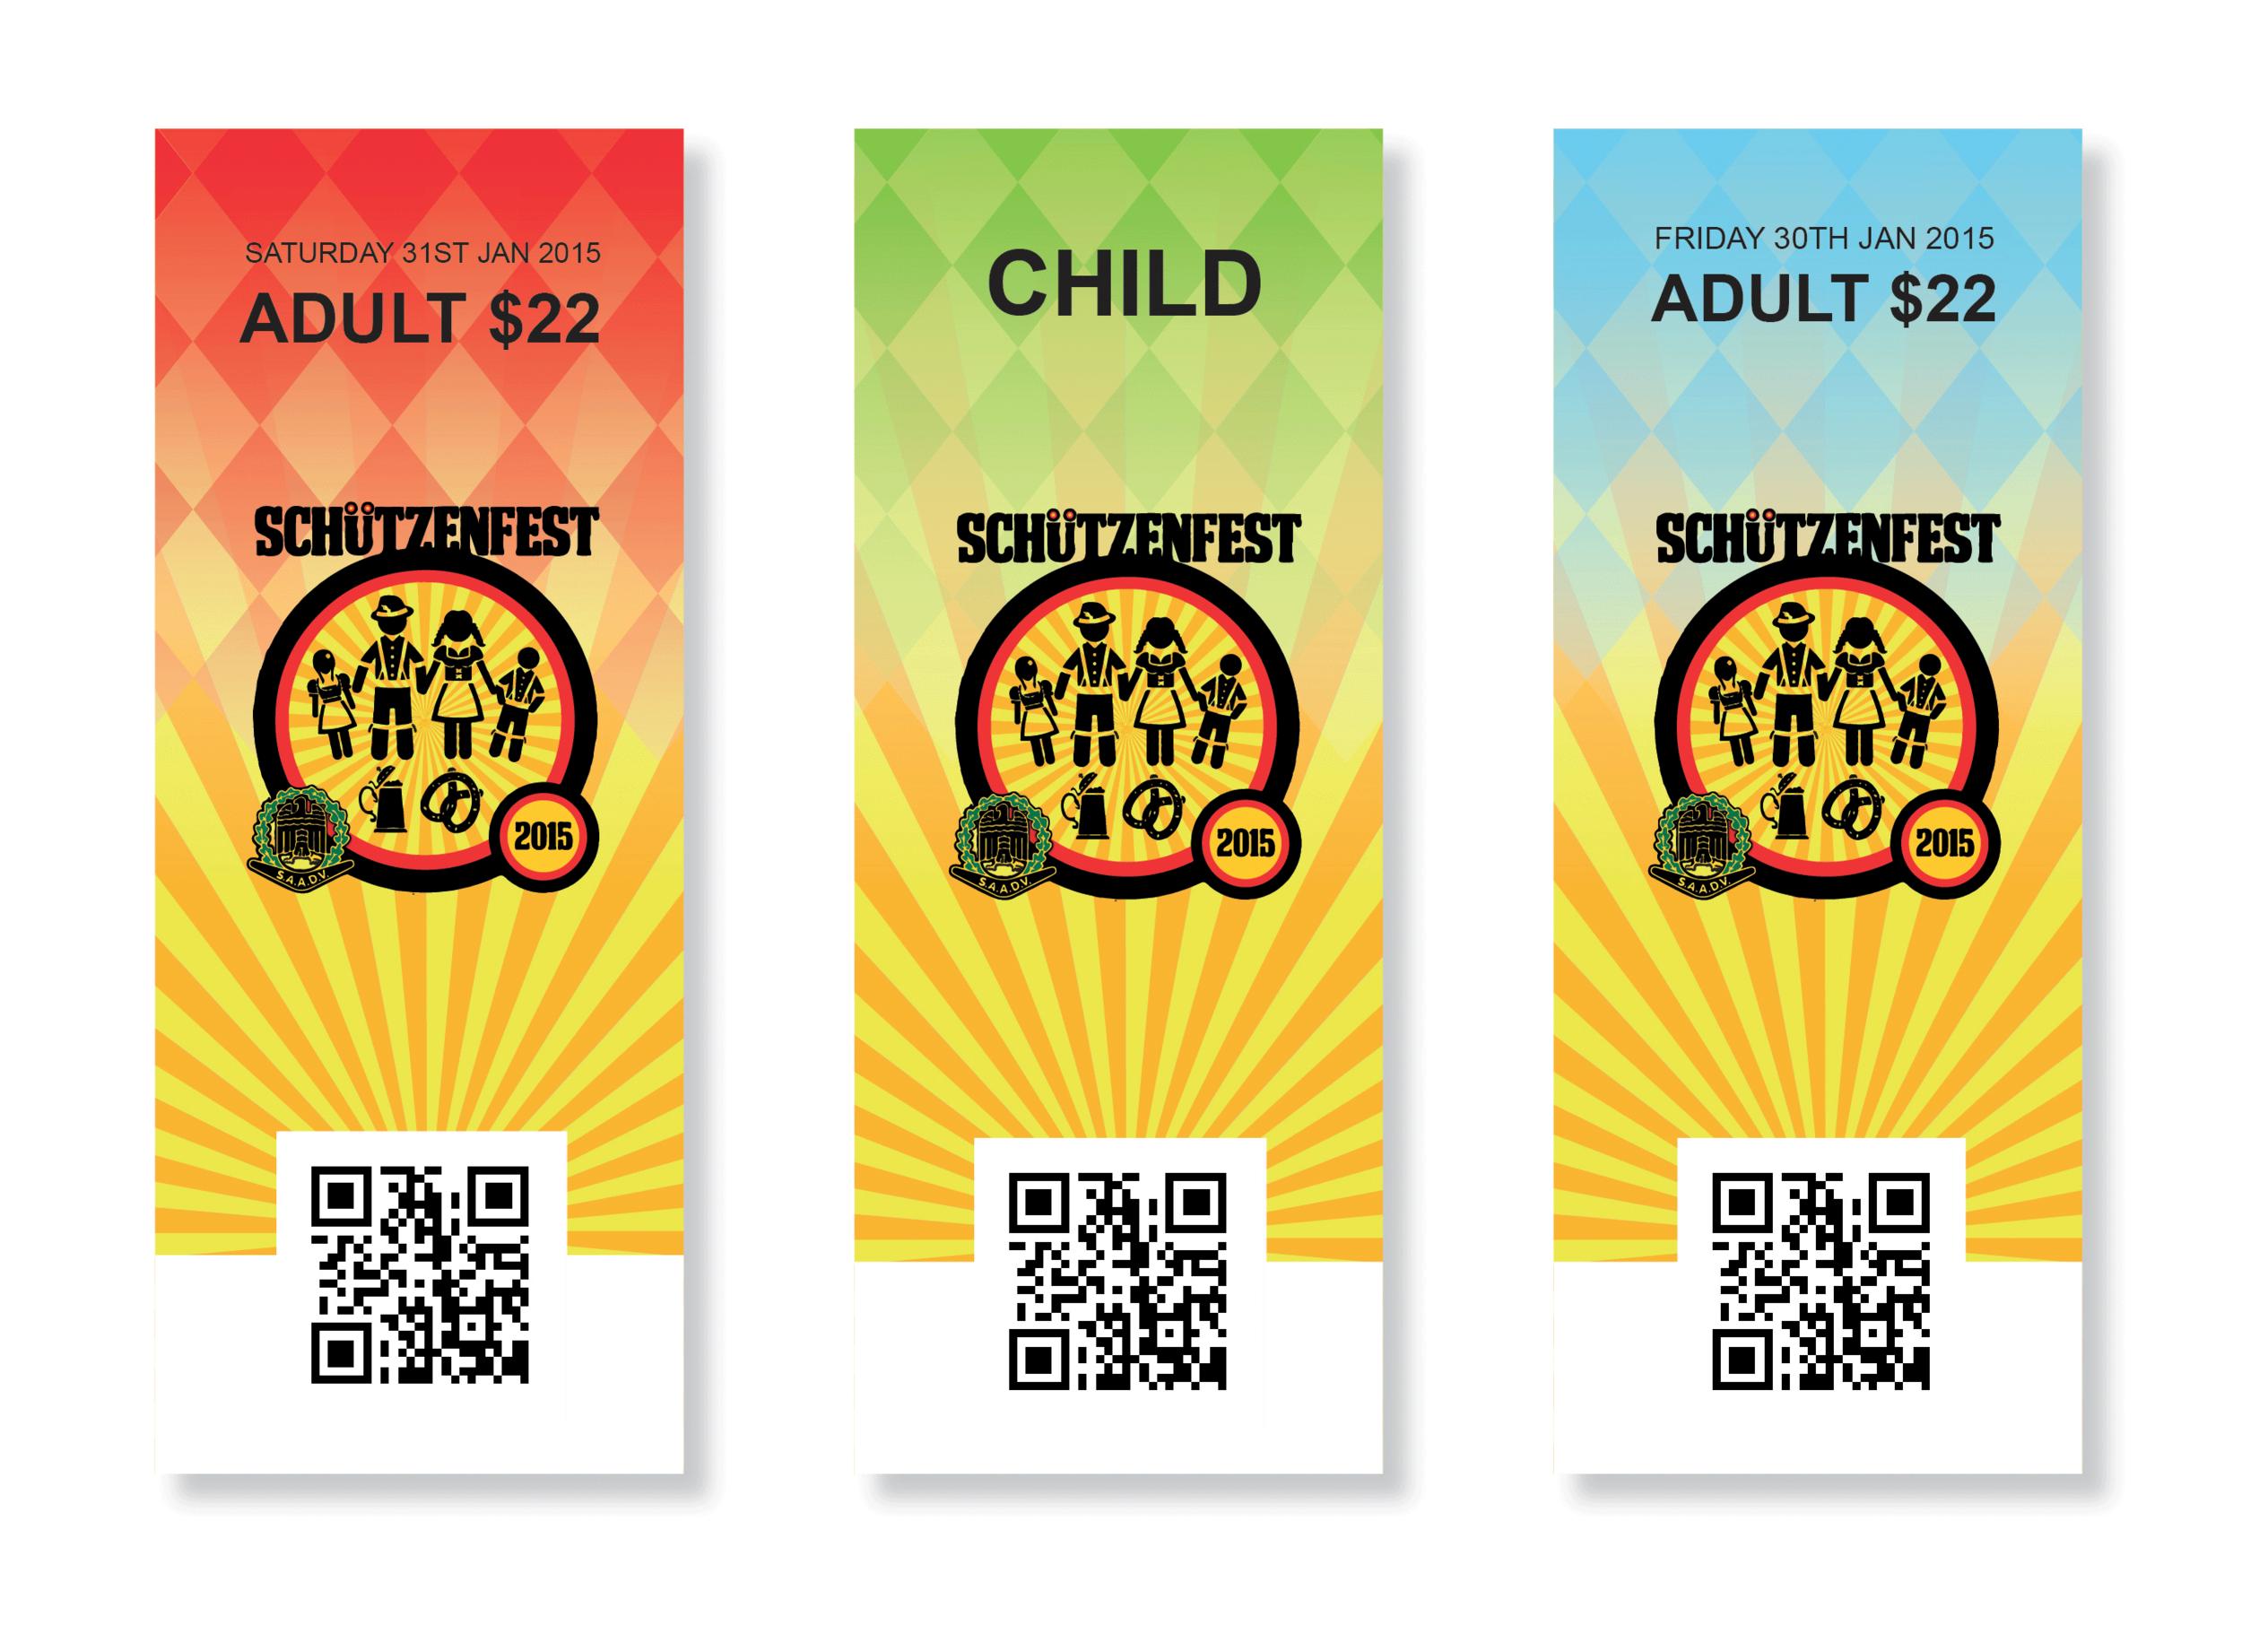 Schutzenfest-Tickets.png